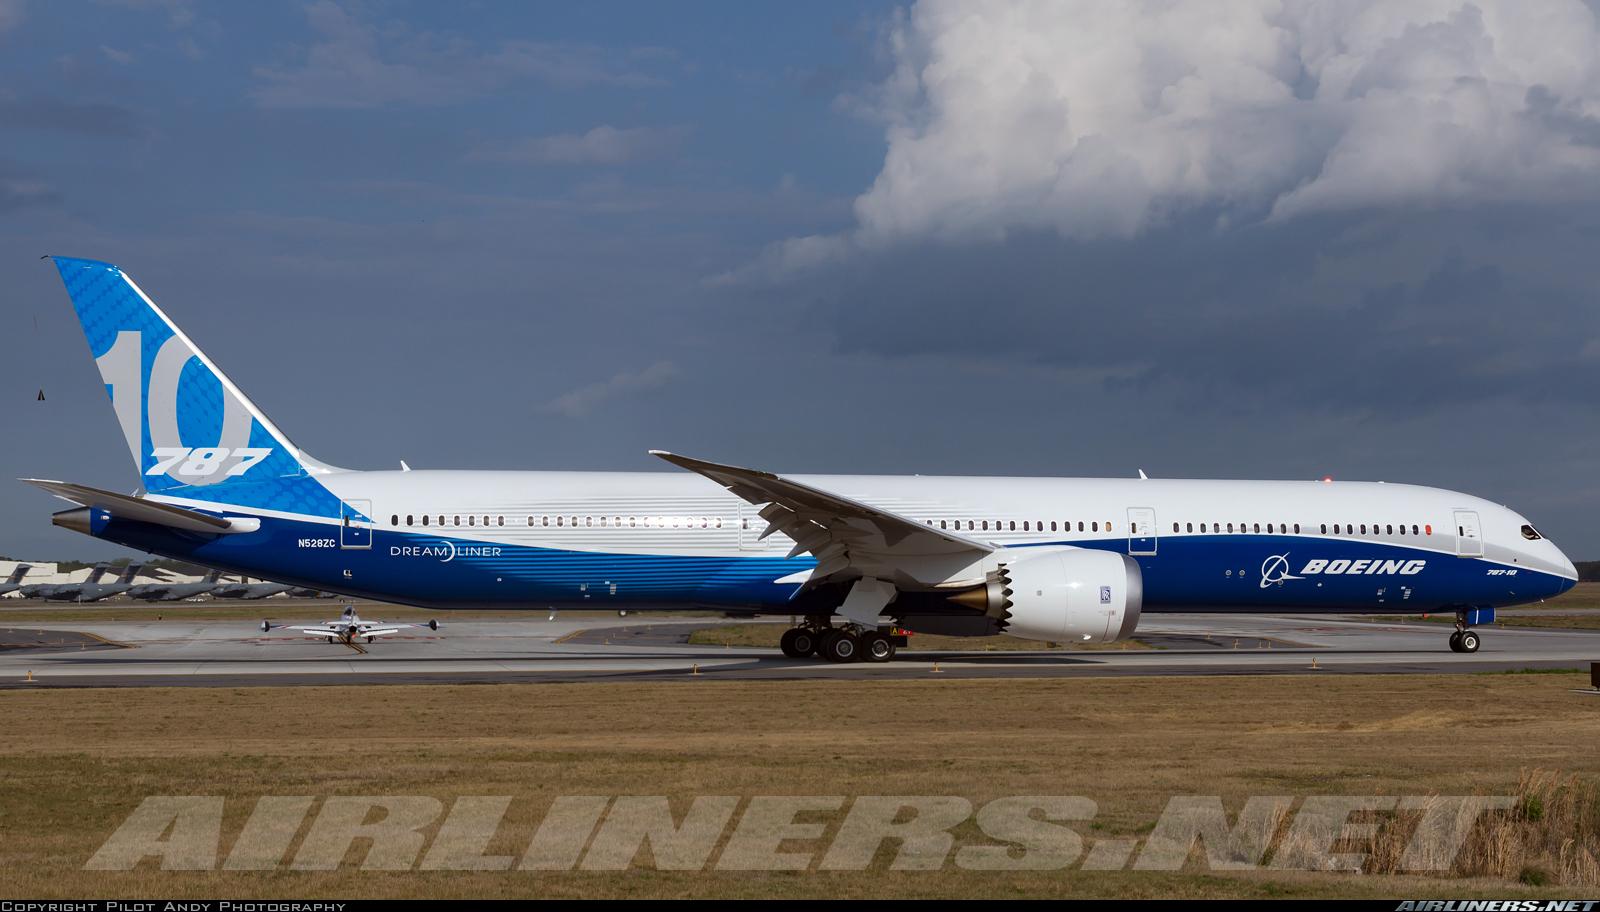 Boeing 787-10 Dreamliner - Boeing   Aviation Photo #4291115   Airliners.net